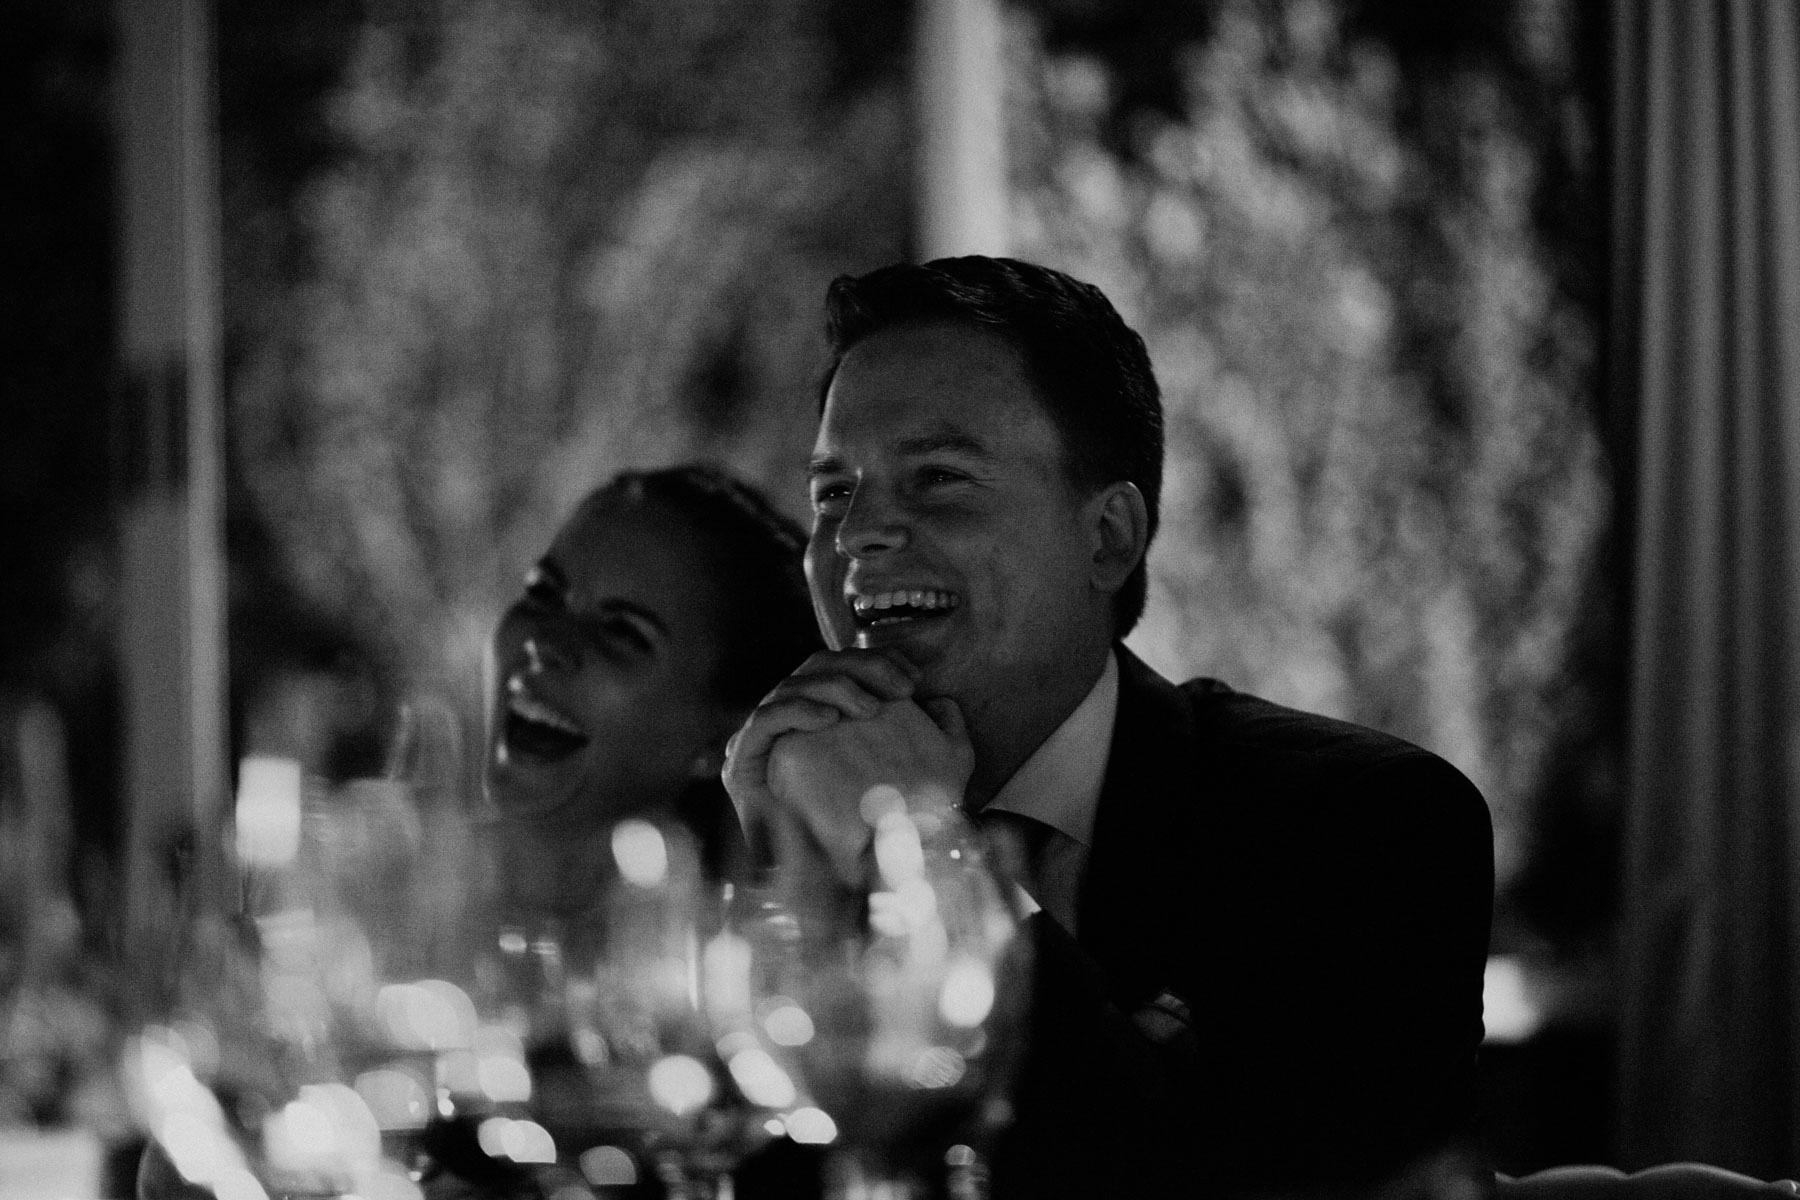 fotografo de bodas Jairo Crena-26